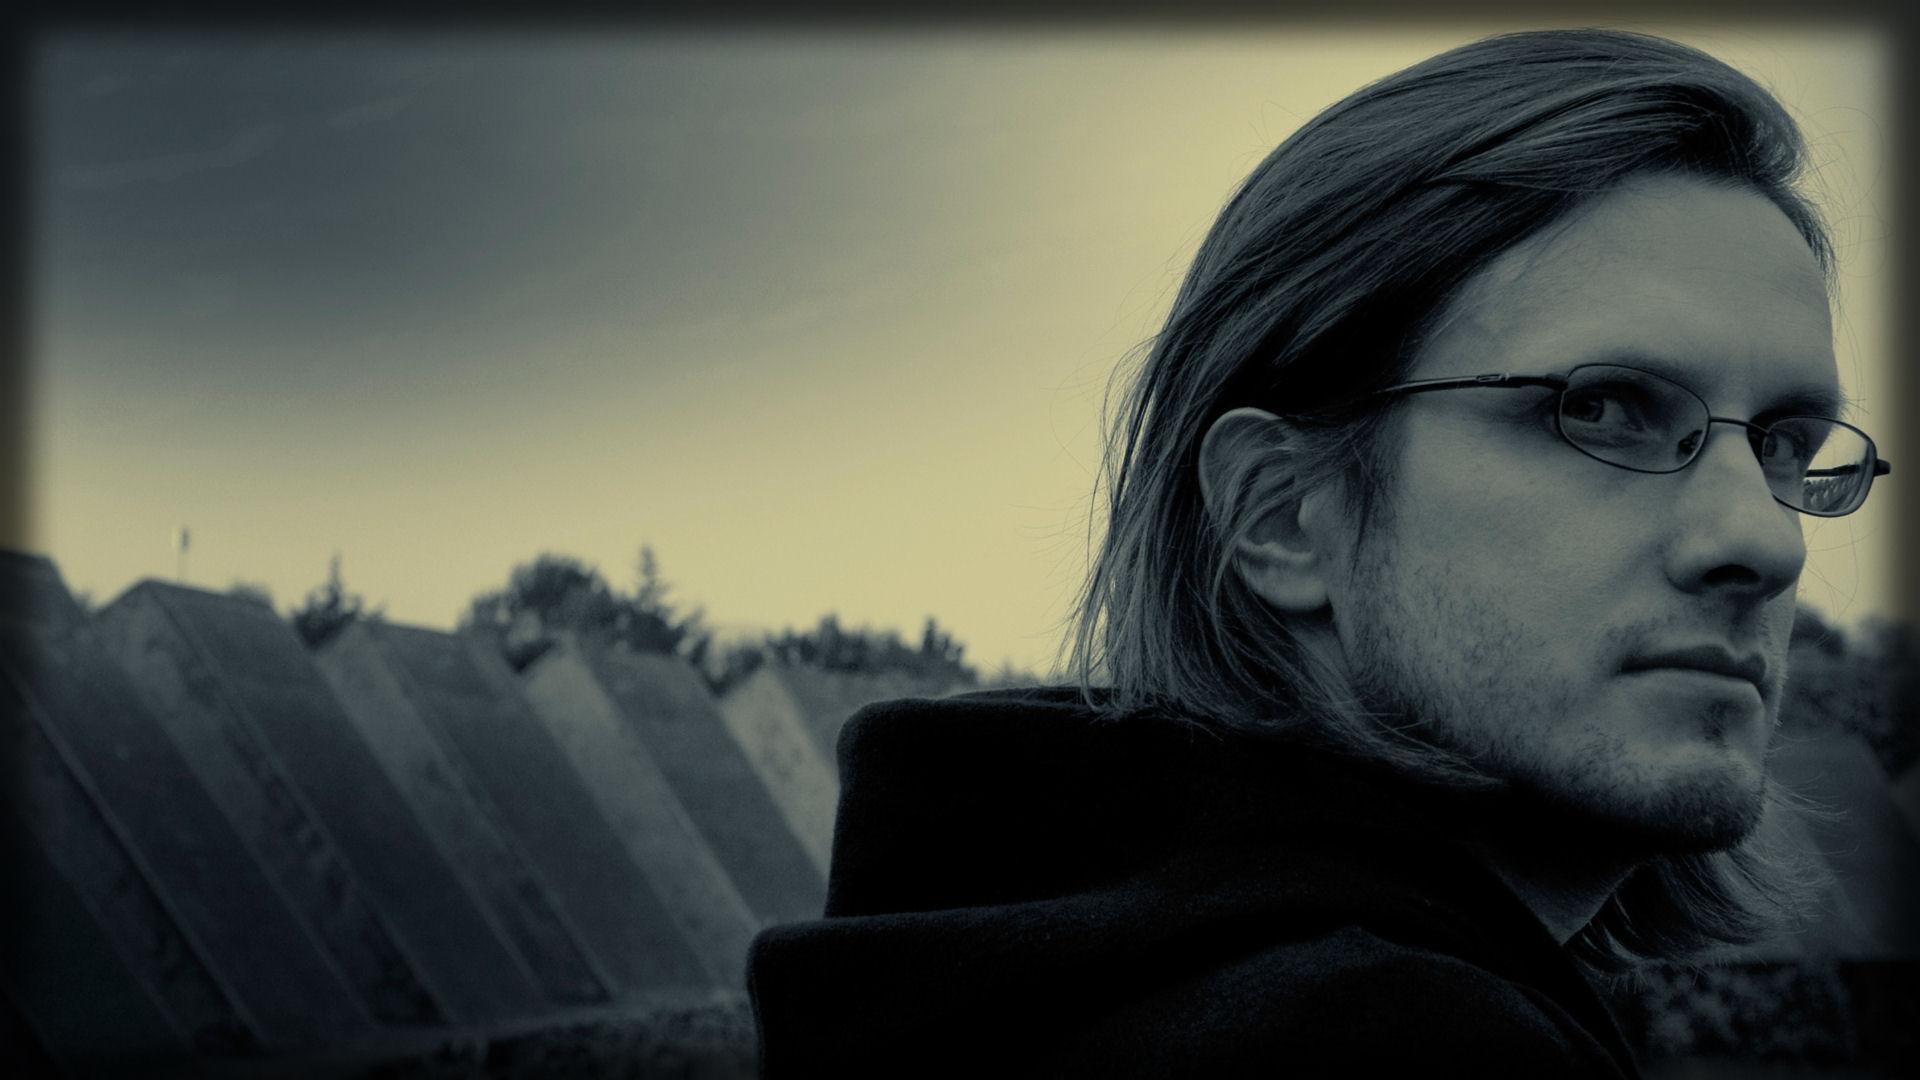 Entrevista Steven Wilson y cmo vivimos desconectados 1920x1080